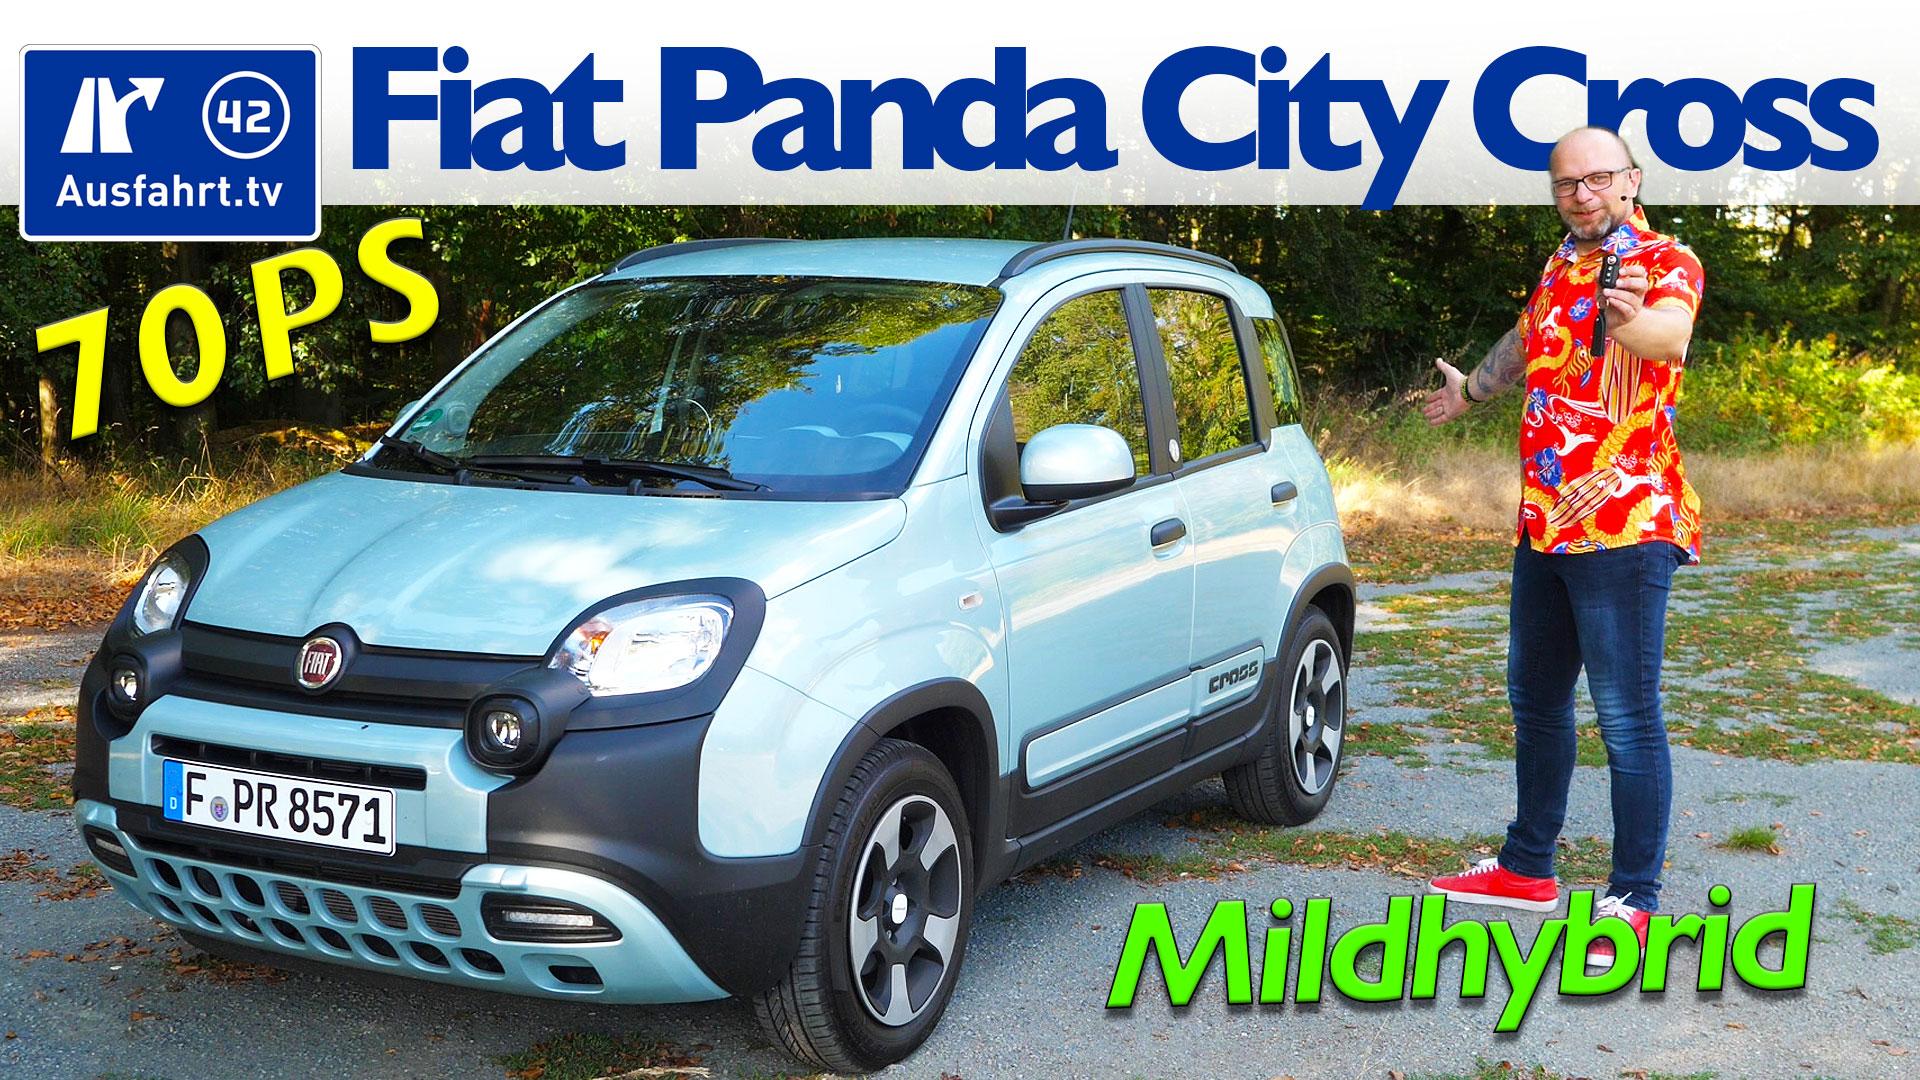 2020 Fiat Panda City Cross Hybrid Launch Edition 1 0 Gse 51kw 70 Ps Ausfahrt Tv